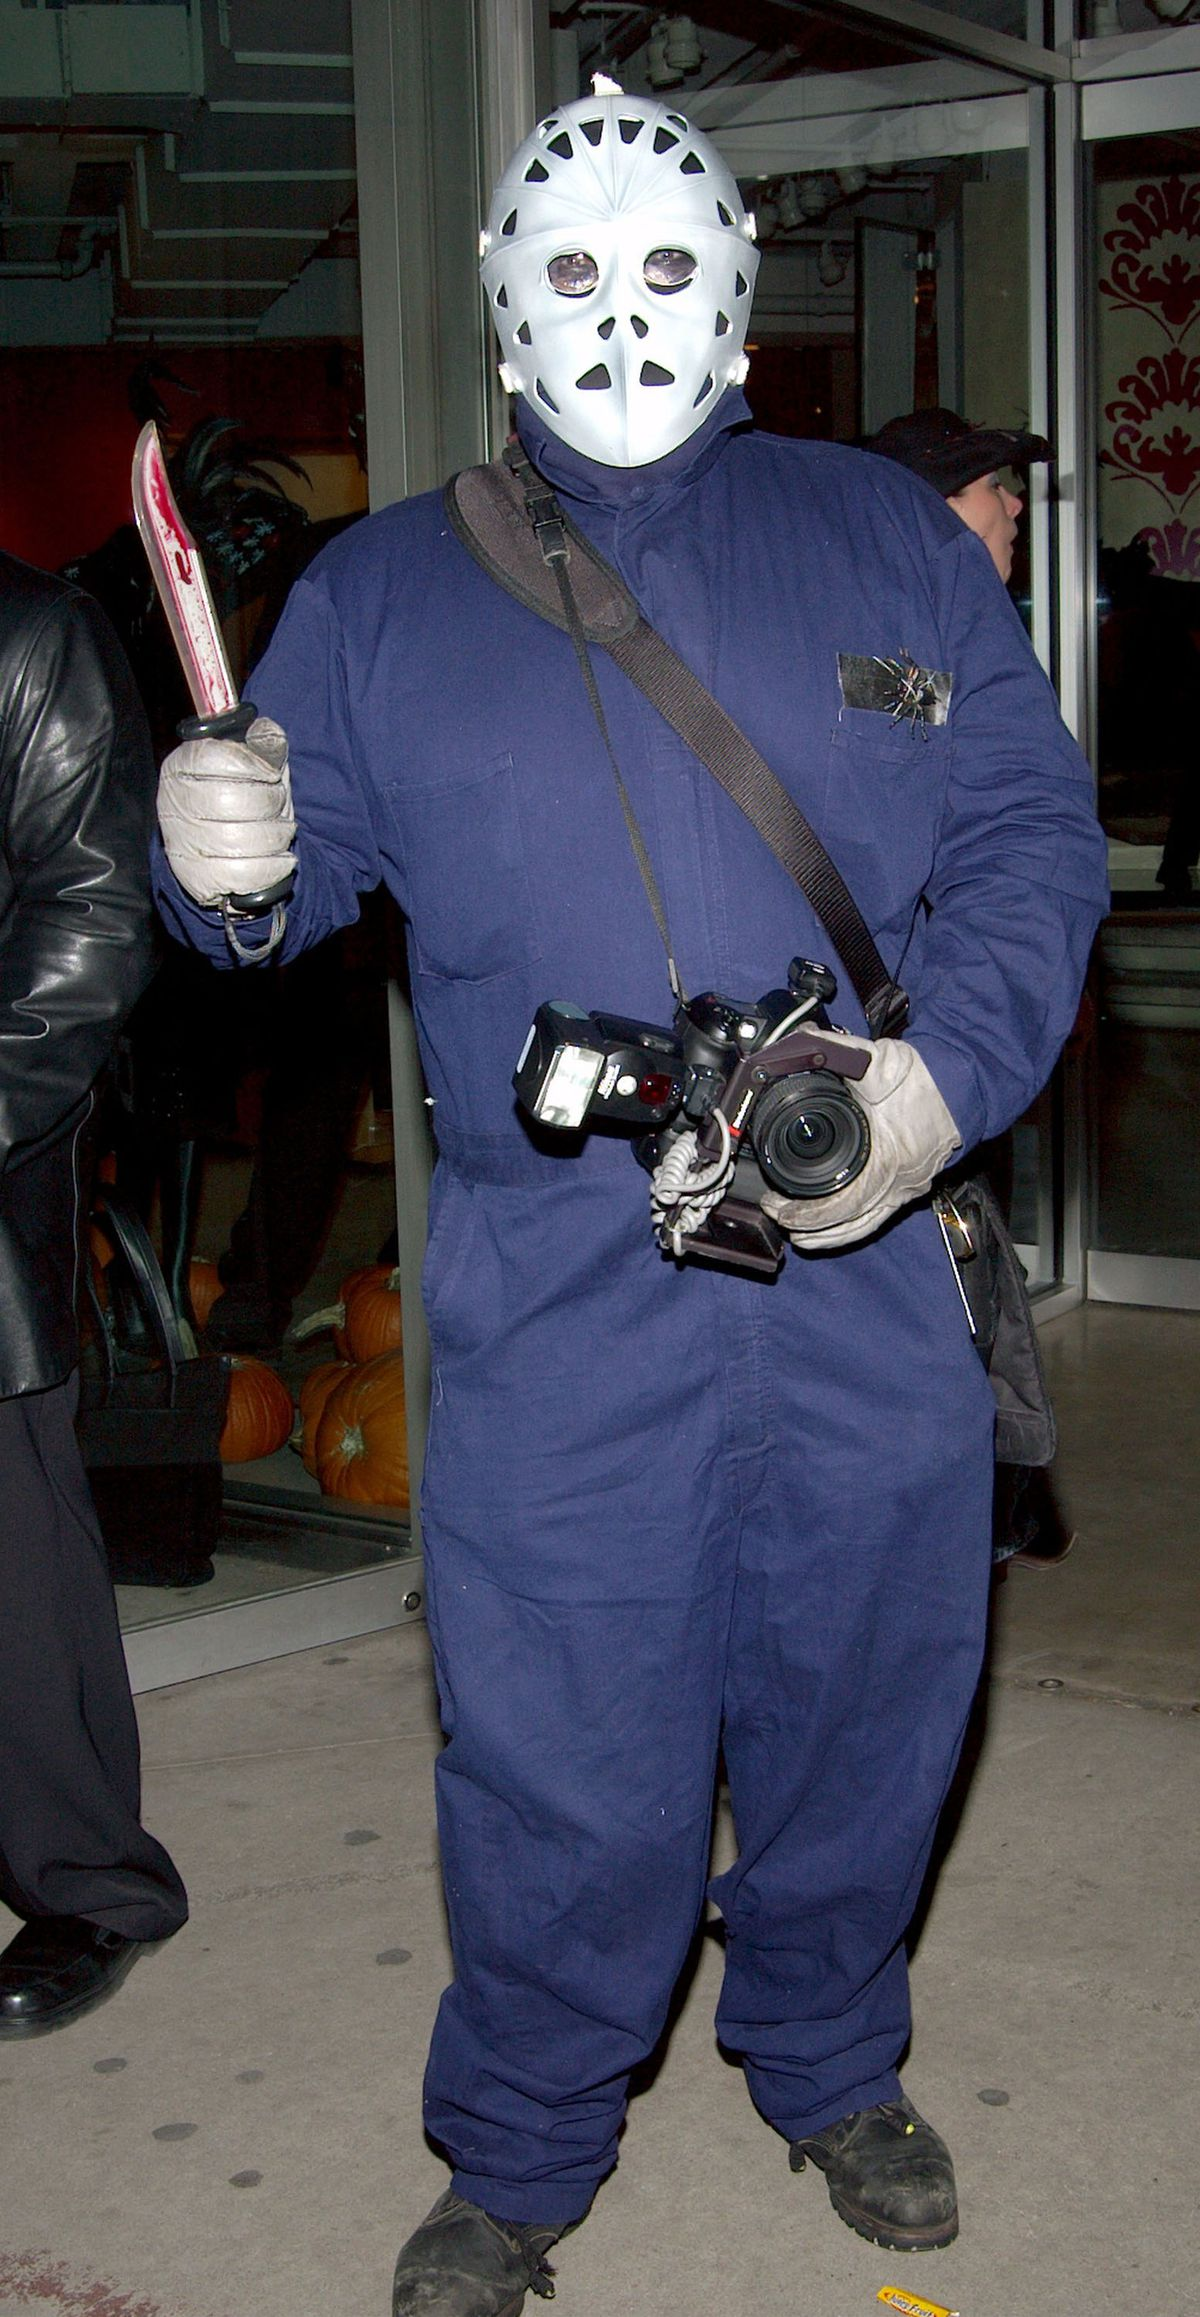 DKNY Halloween Party